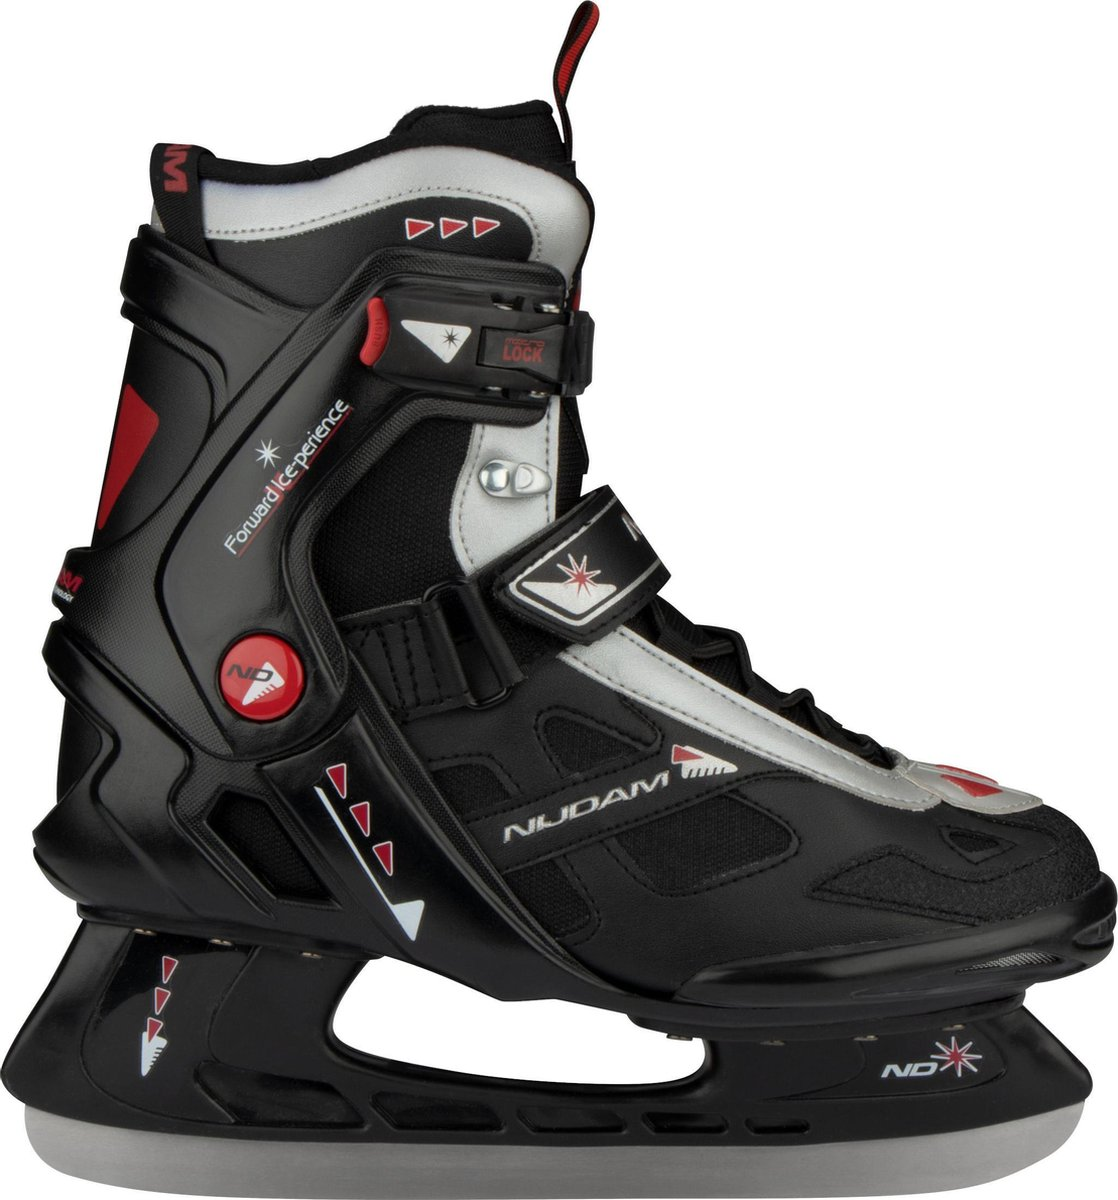 Nijdam IJshockeyschaats - Semi-Softboot - Zwart/Zilver/Rood - 40